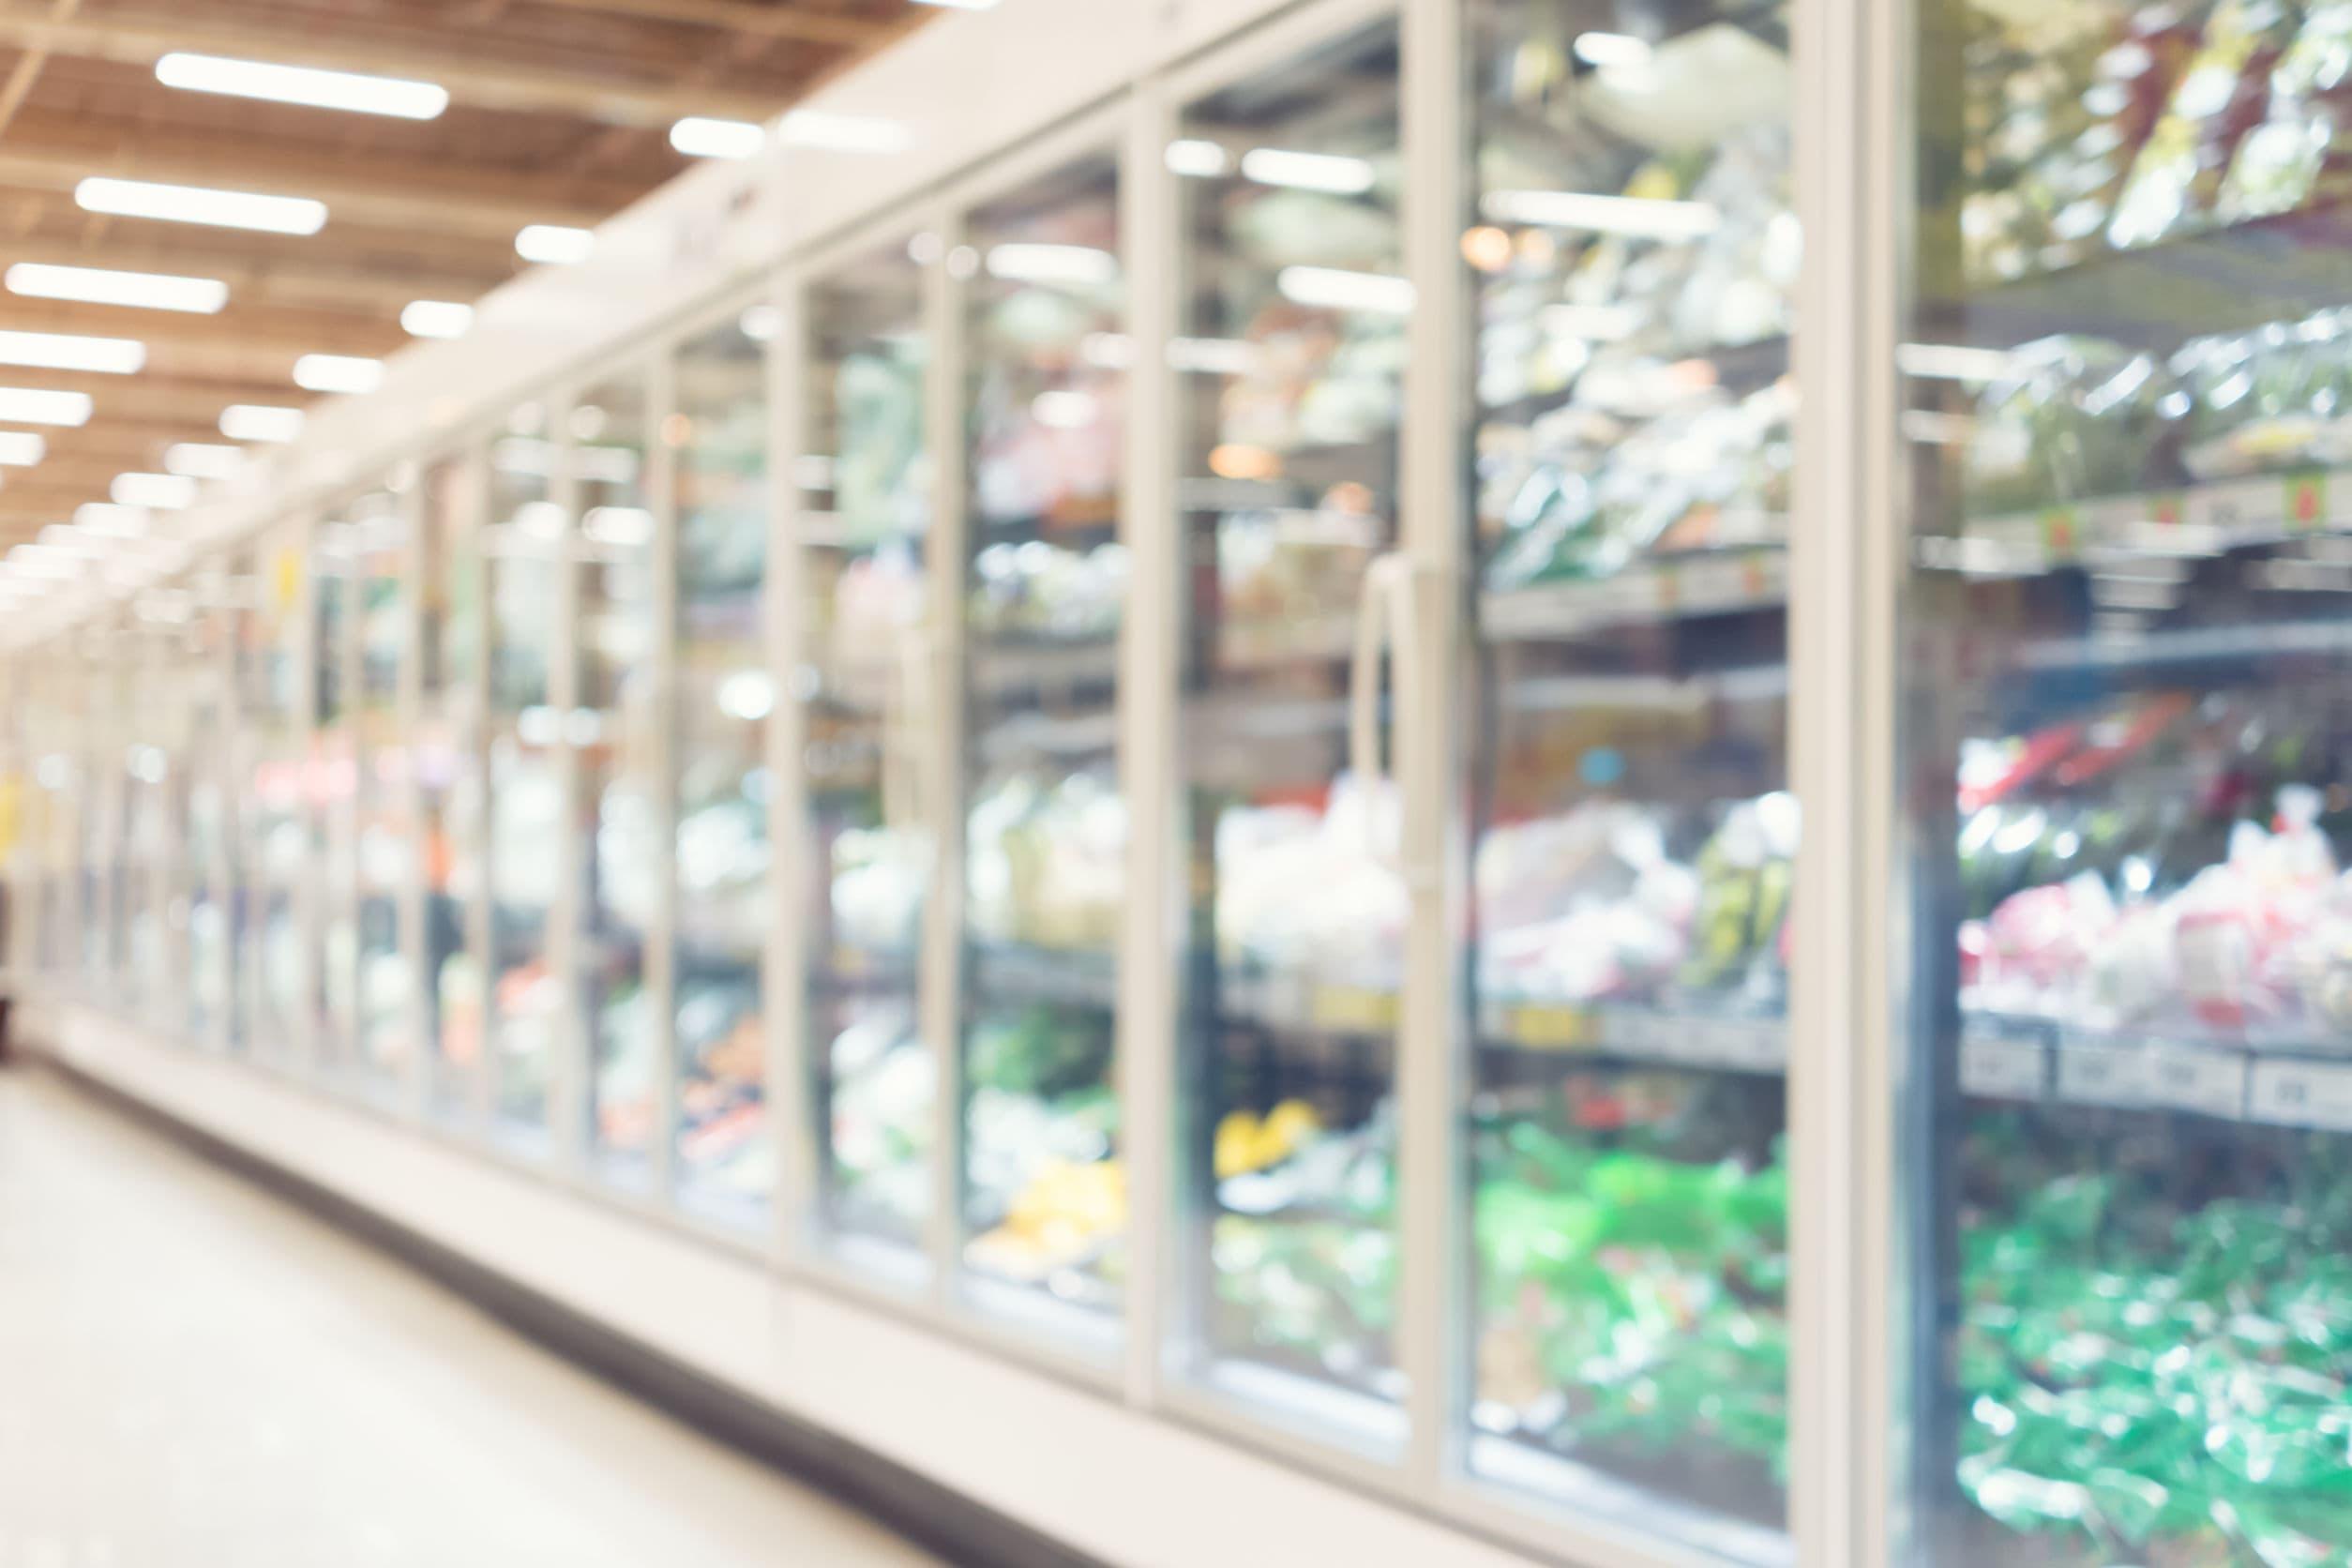 Commercial Freezers Preserve Autumn's Bounty